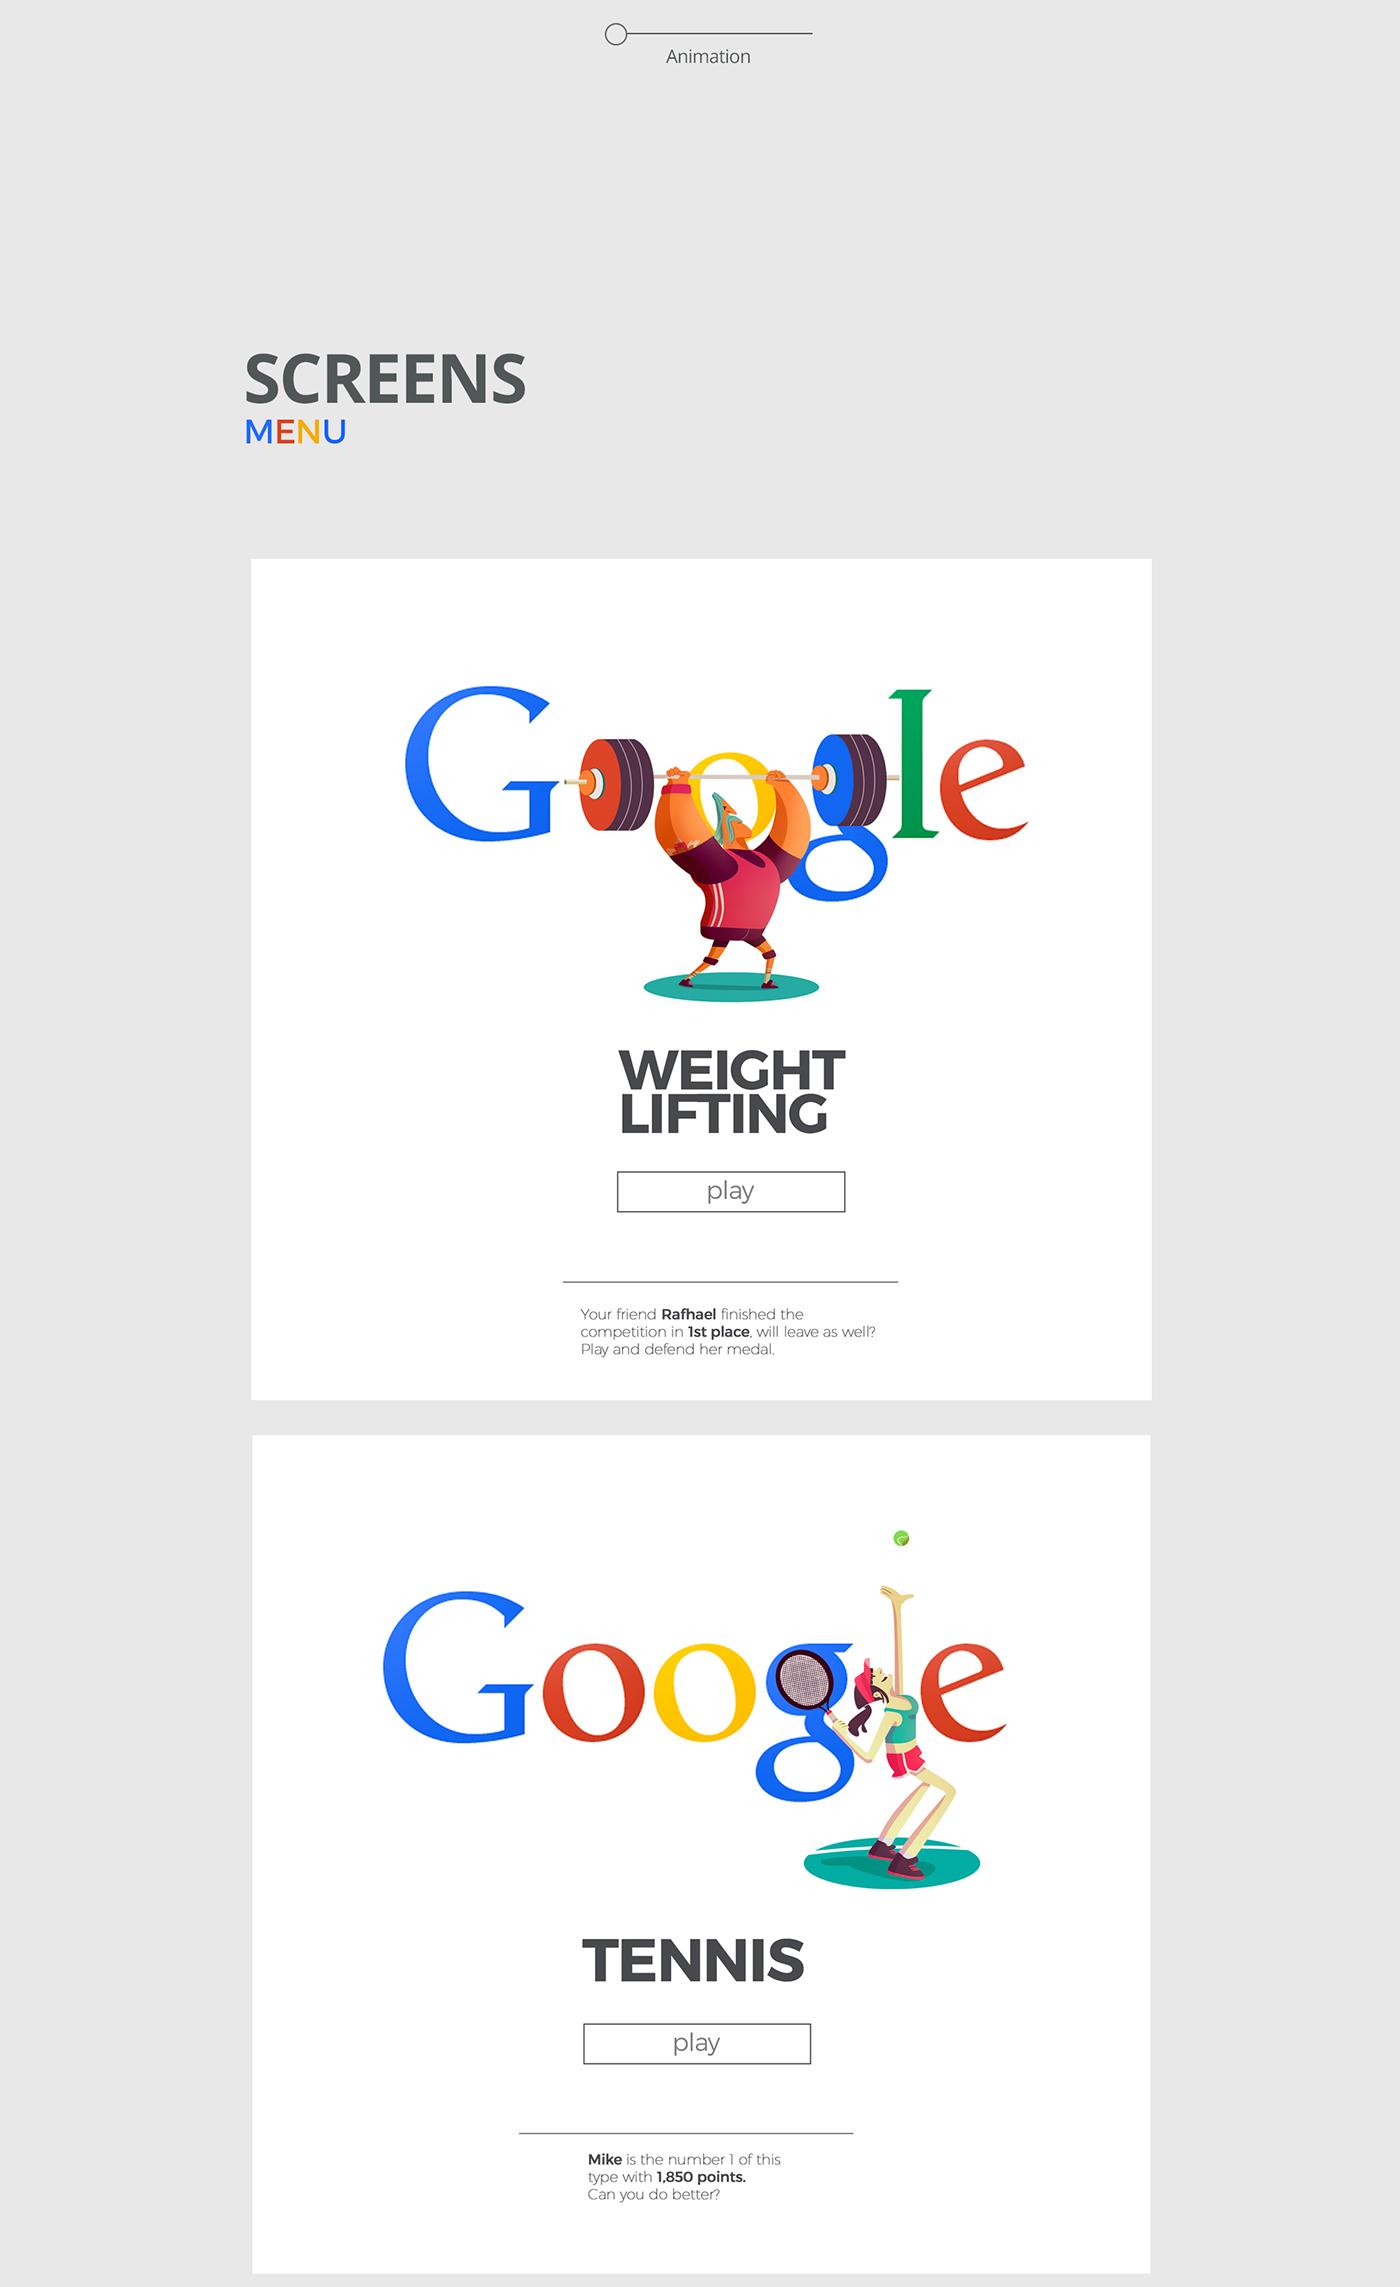 google doodle rio 2016 Character Olympics flat design flat sports mobile